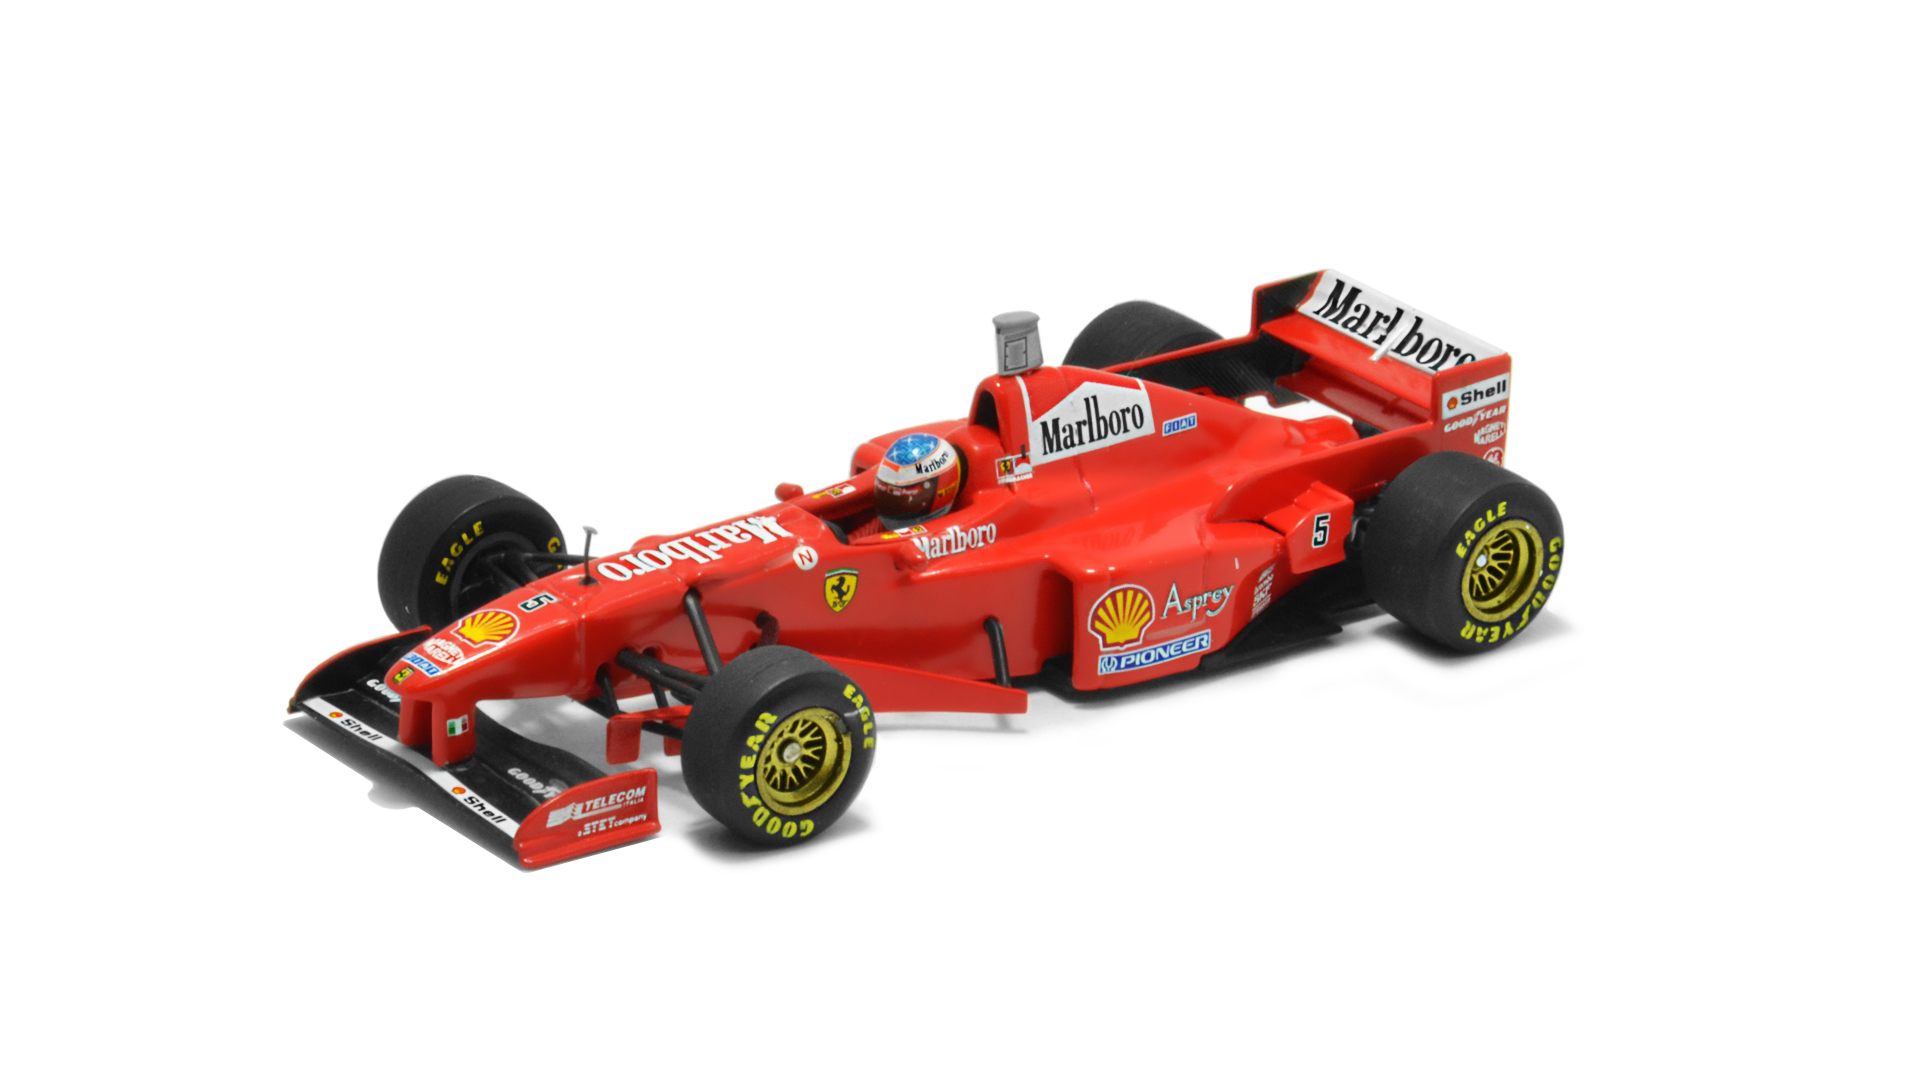 Év: 1997<br />Modell: F310B<br />Gyártó: Minichamps<br />Pilóta: Michael Schumacher